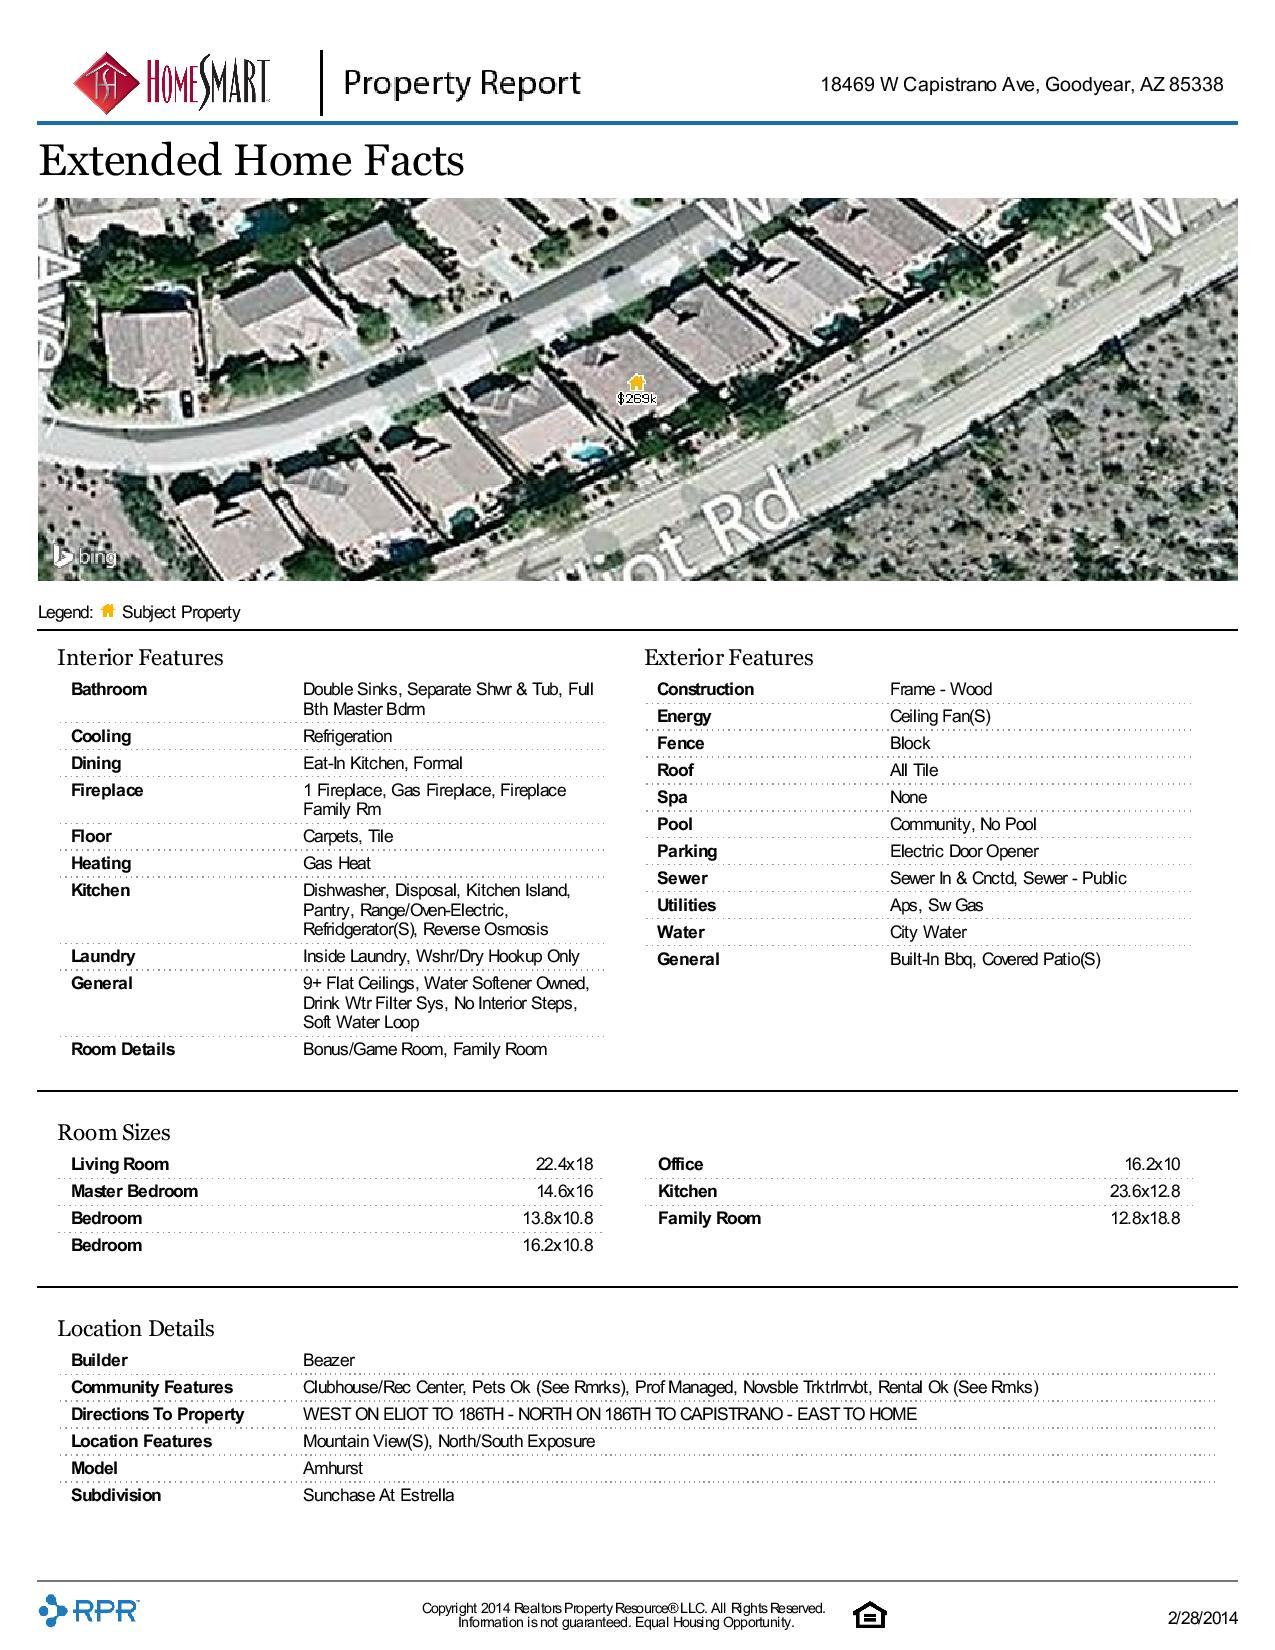 18469-W-Capistrano-Ave-Goodyear-AZ-85338-page-004